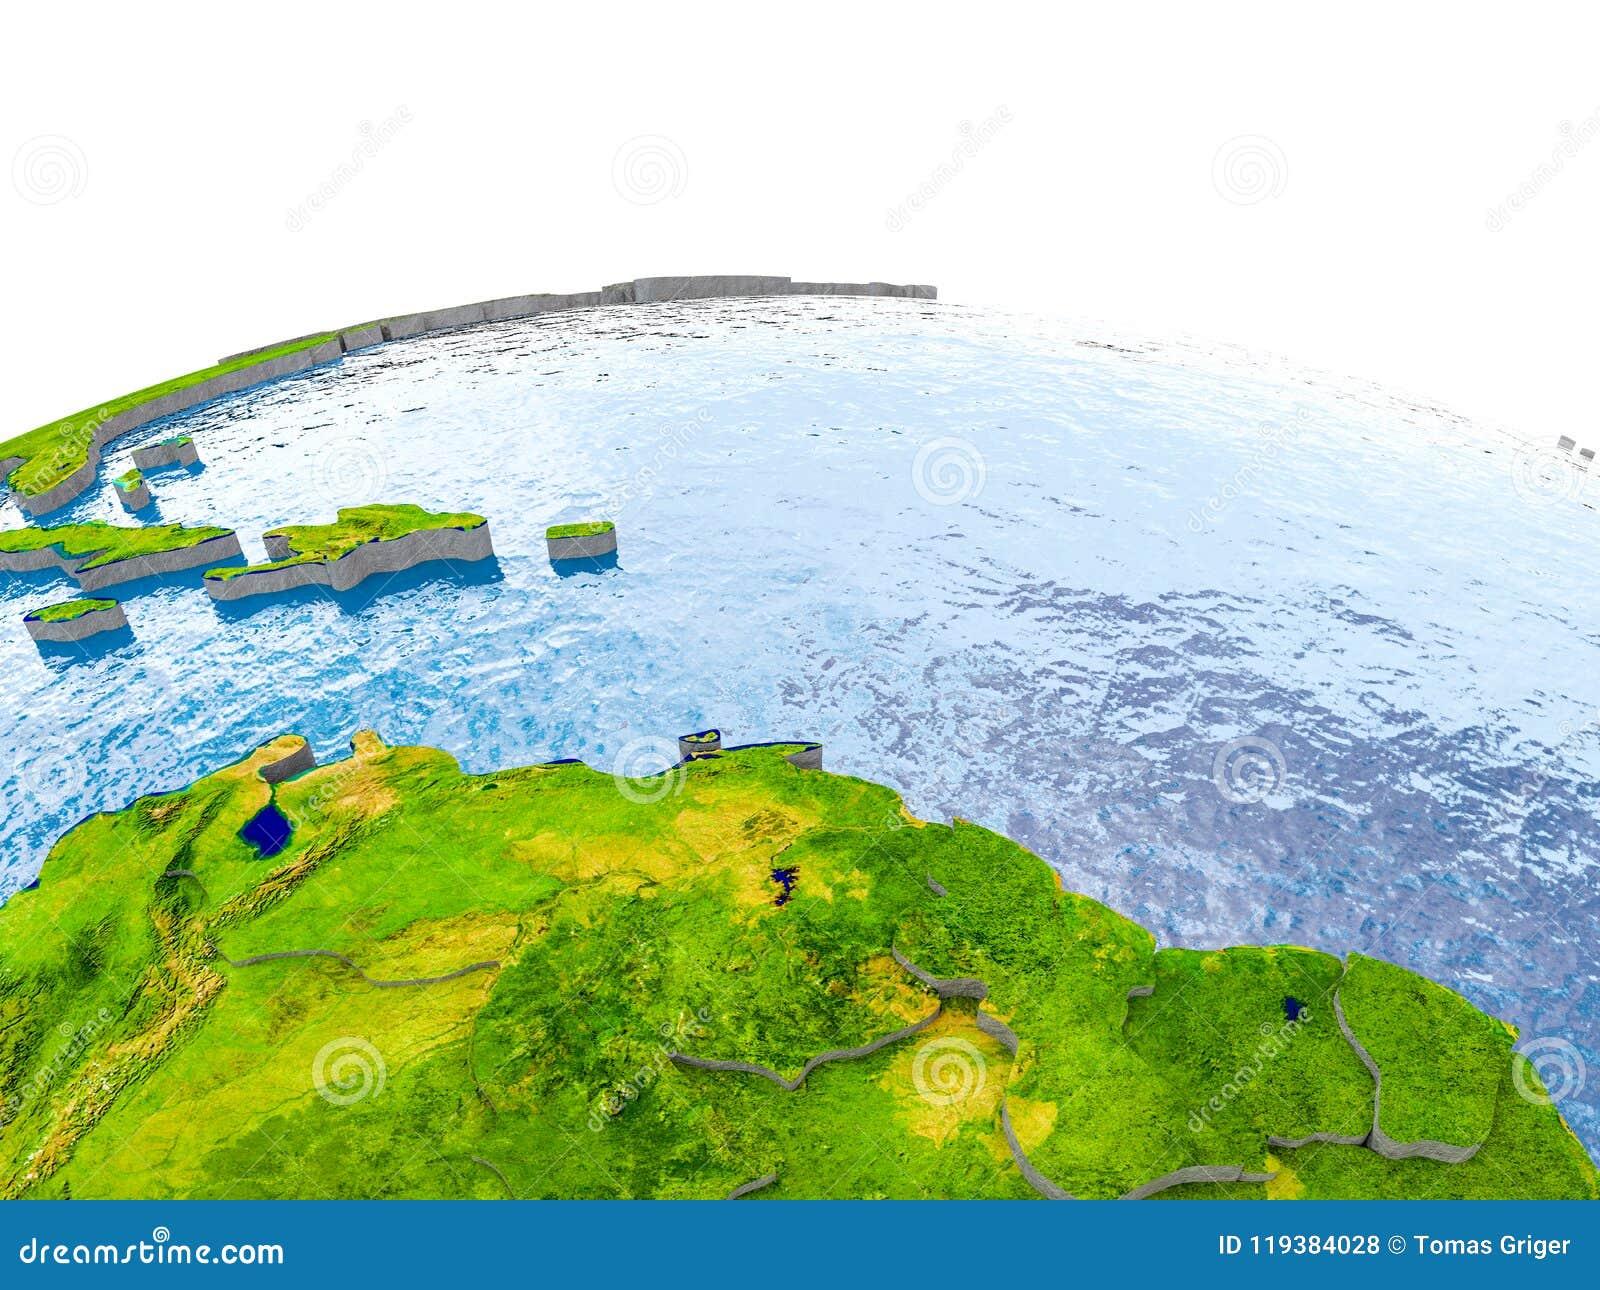 Caribbean on model of Earth